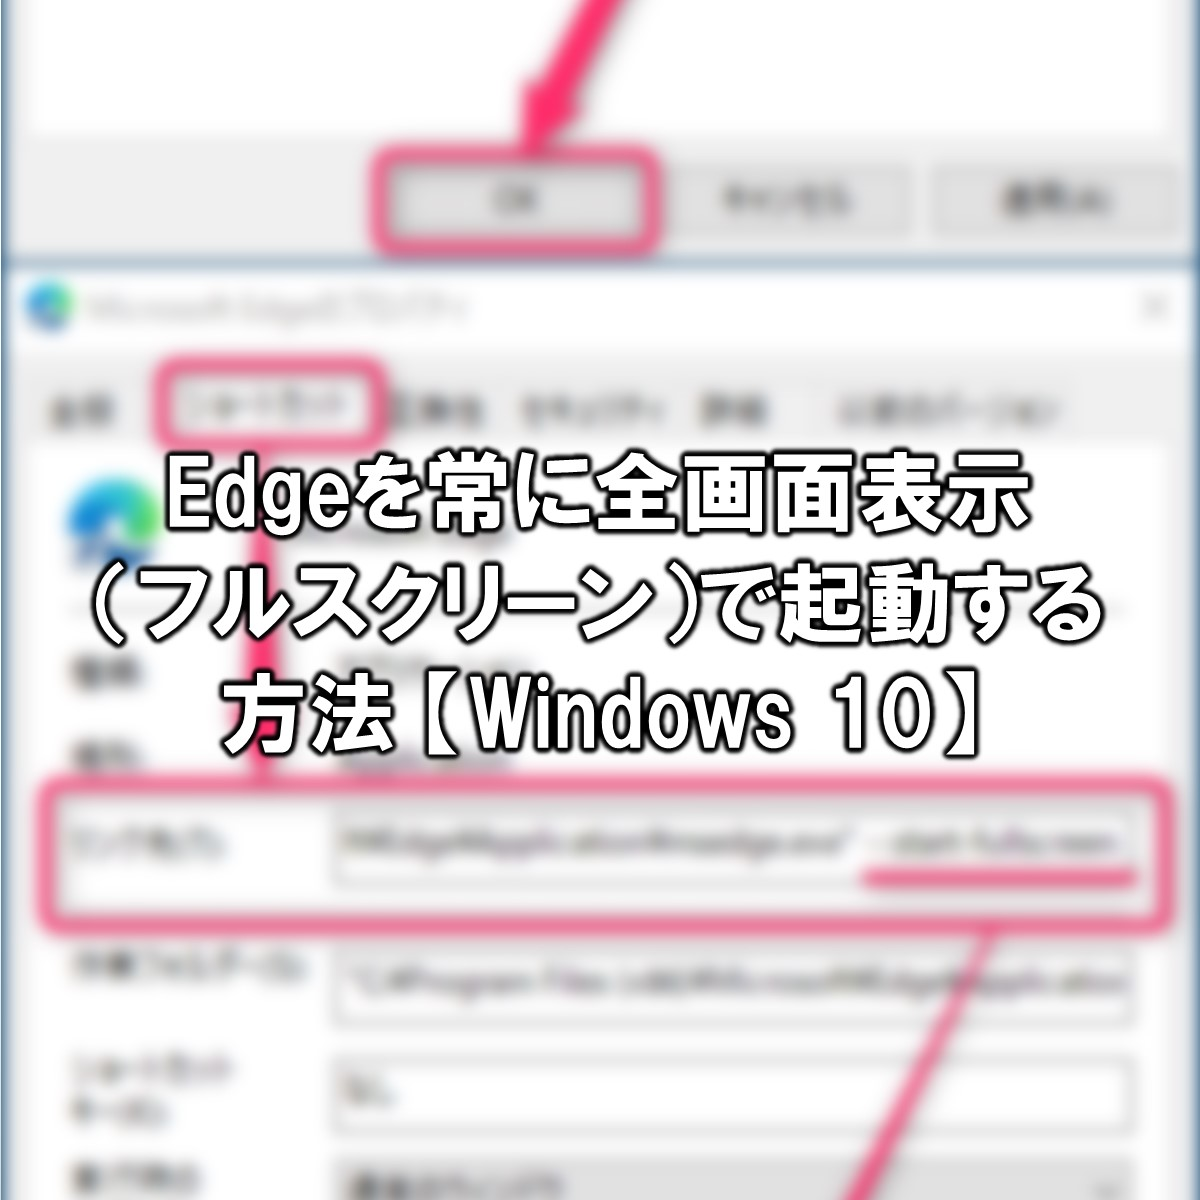 Edgeを常に全画面表示(フルスクリーン)で起動する方法